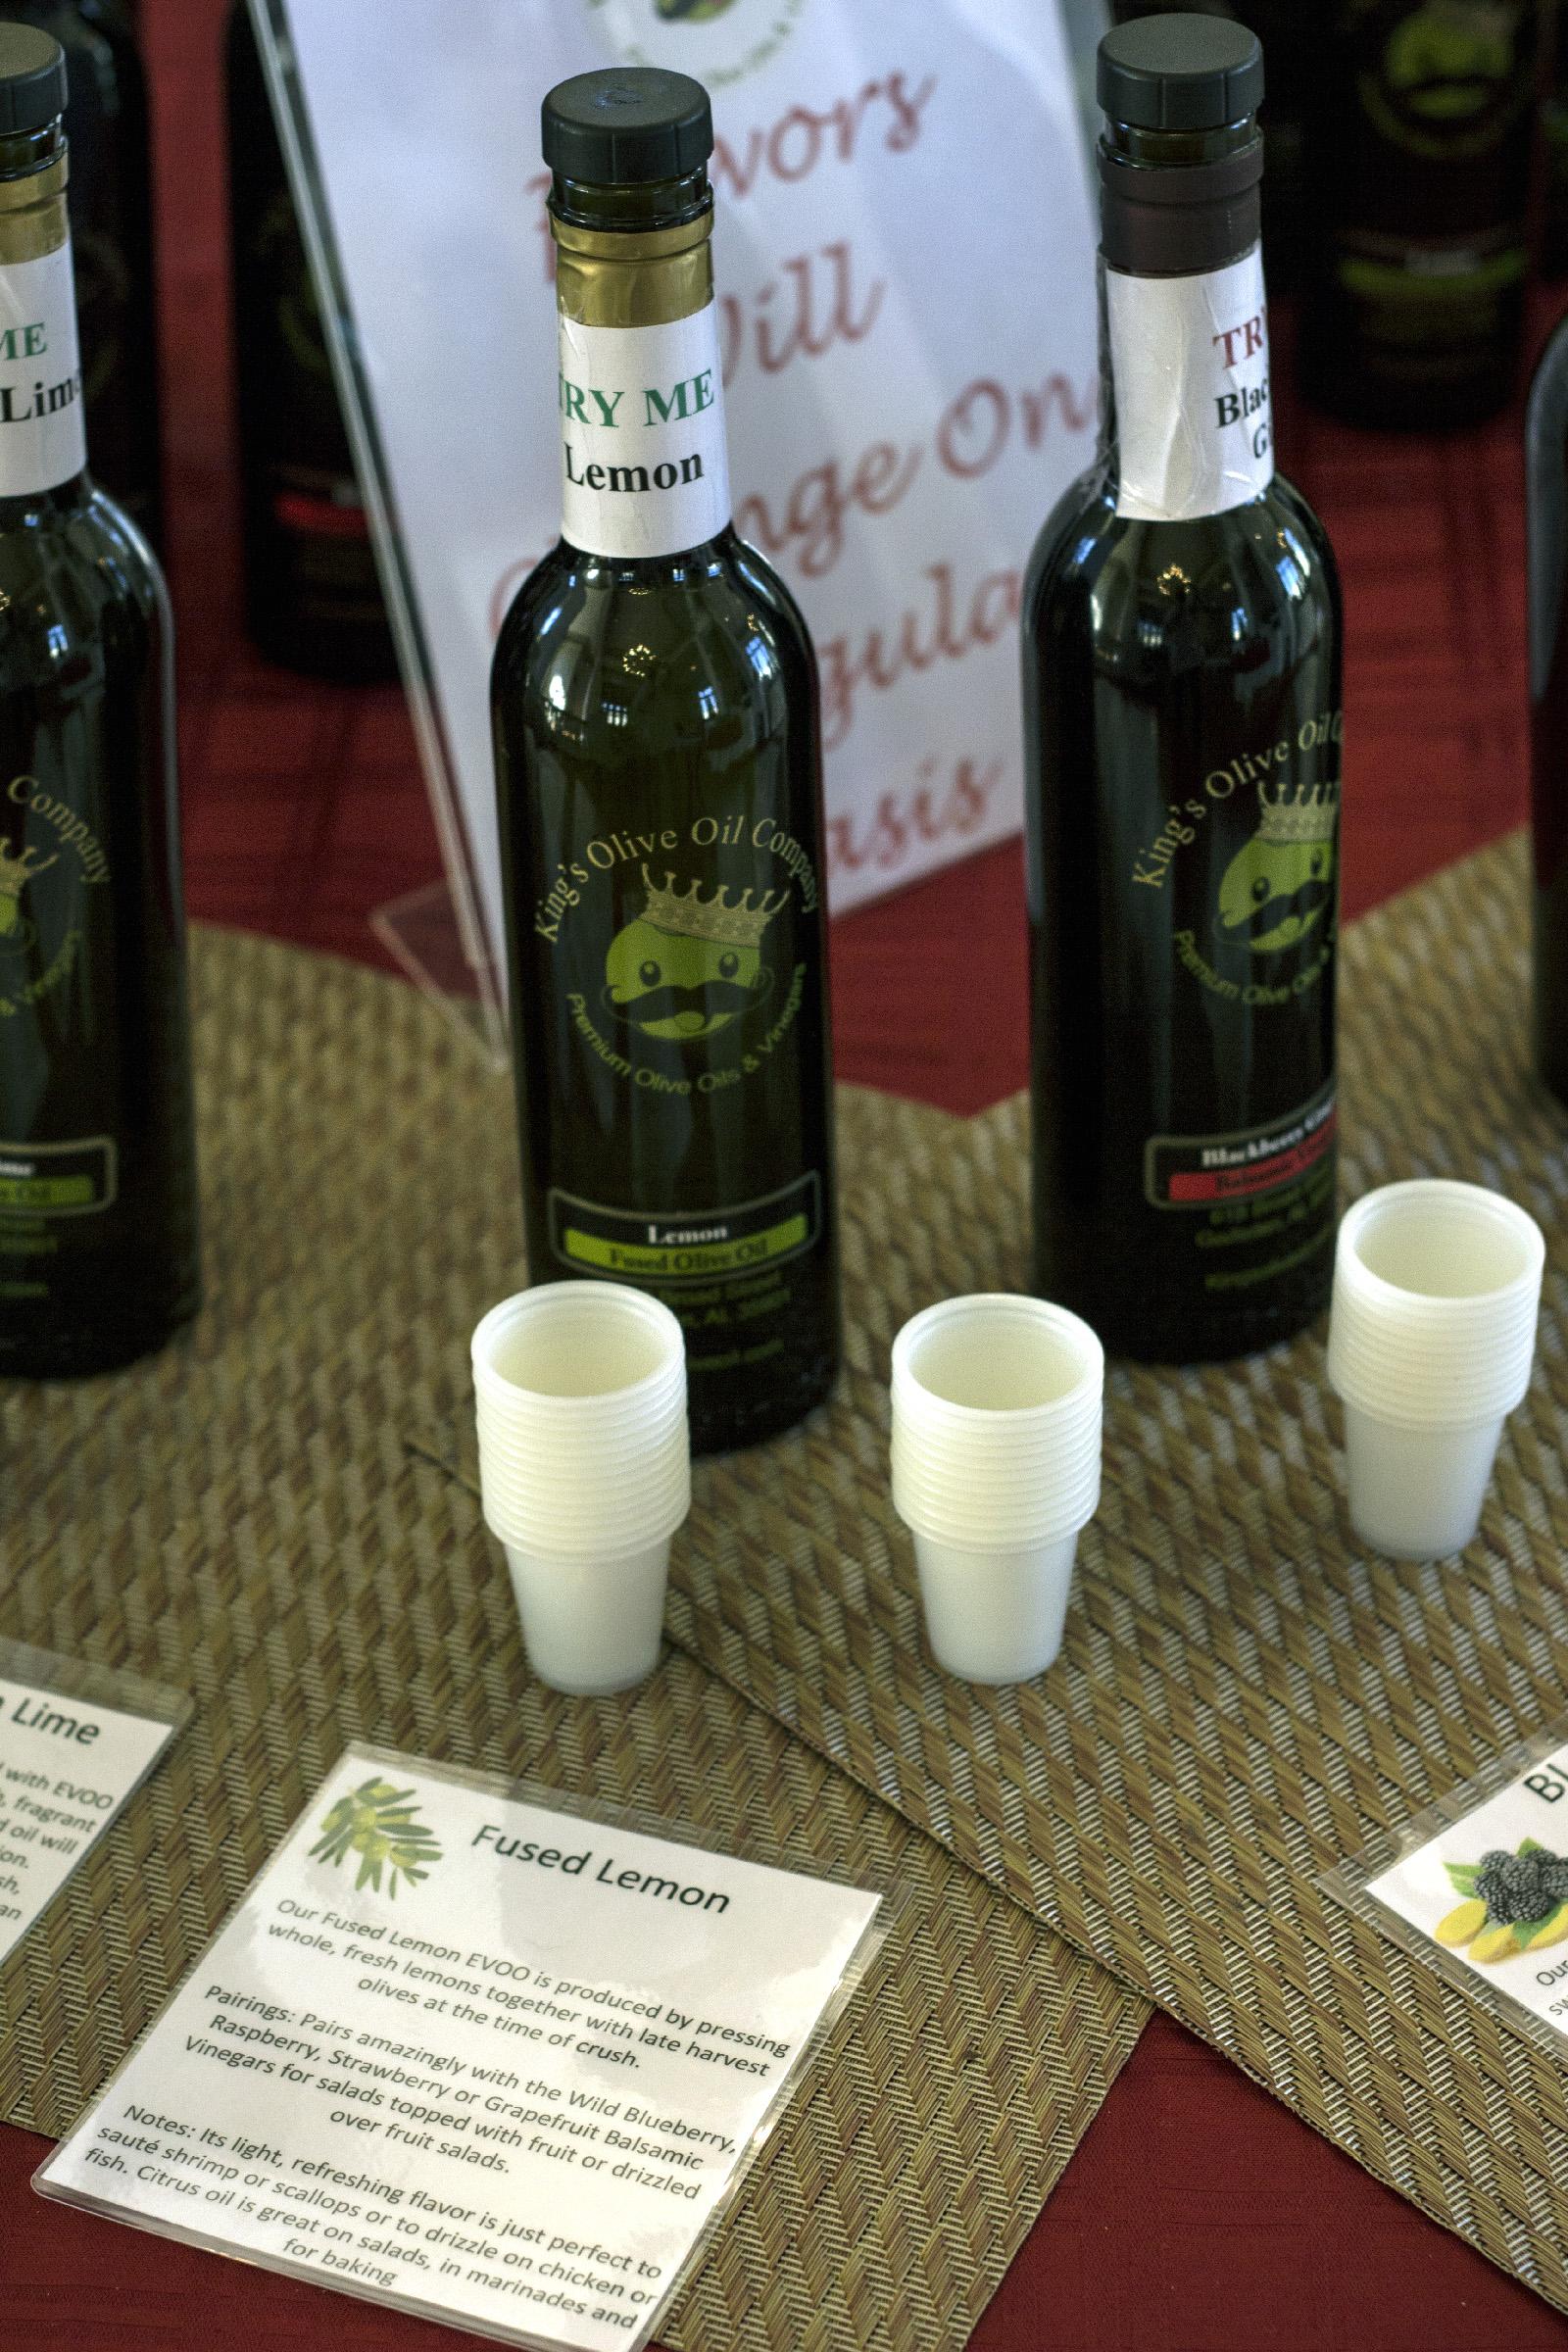 King's Olive Oil